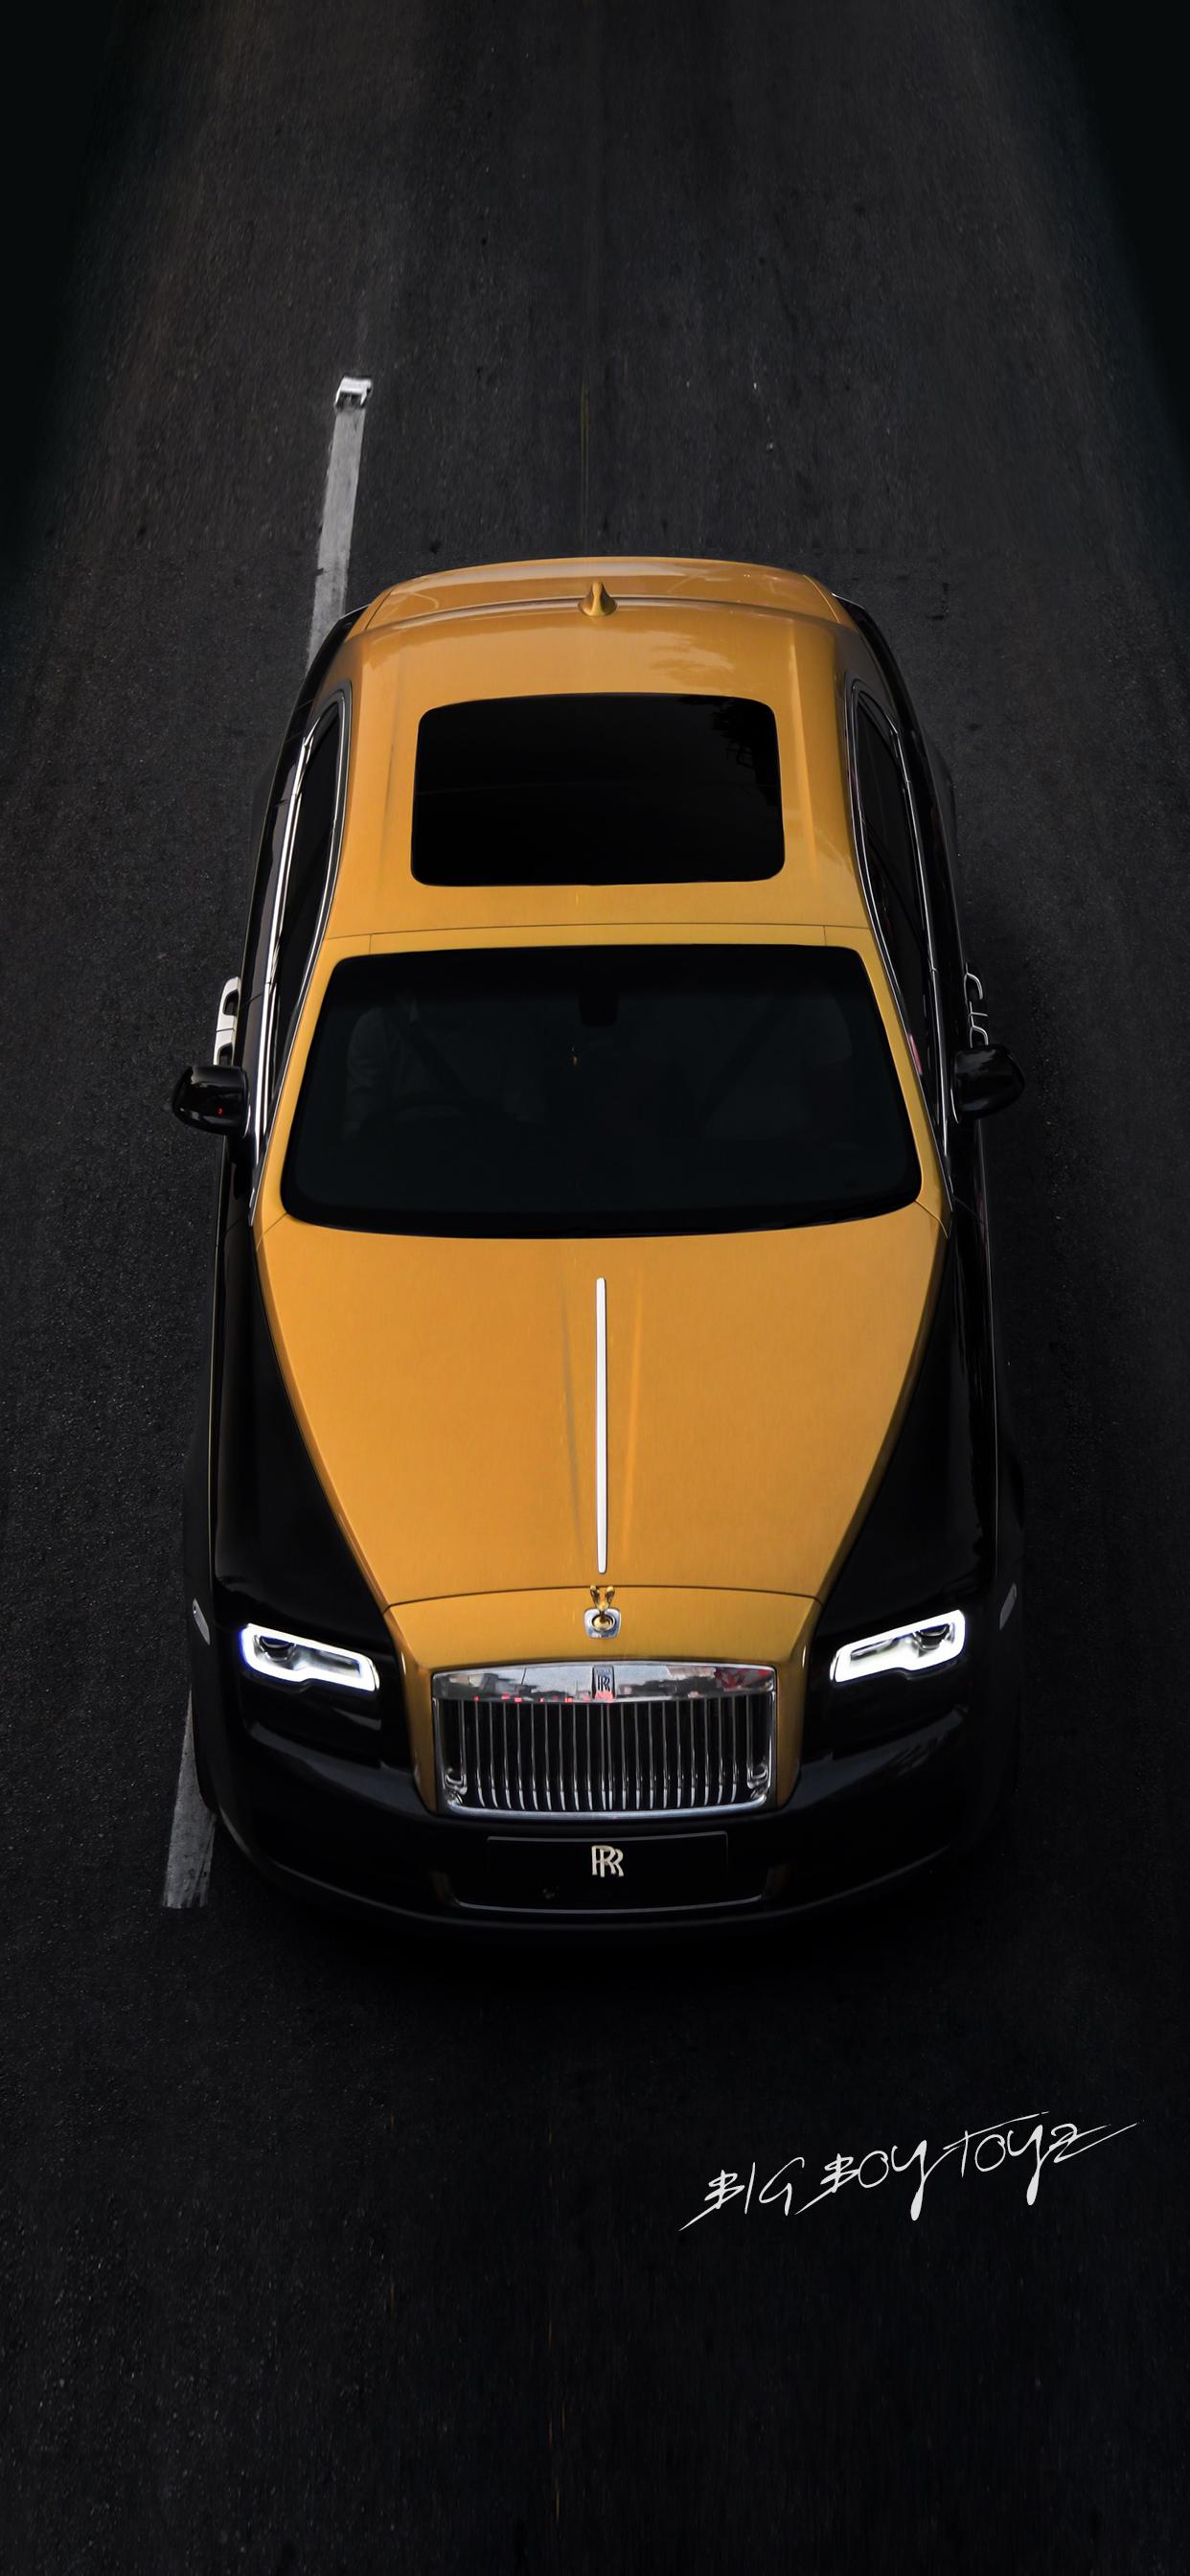 Rolls Royce Black And Gold 1242x2688 Wallpaper Teahub Io